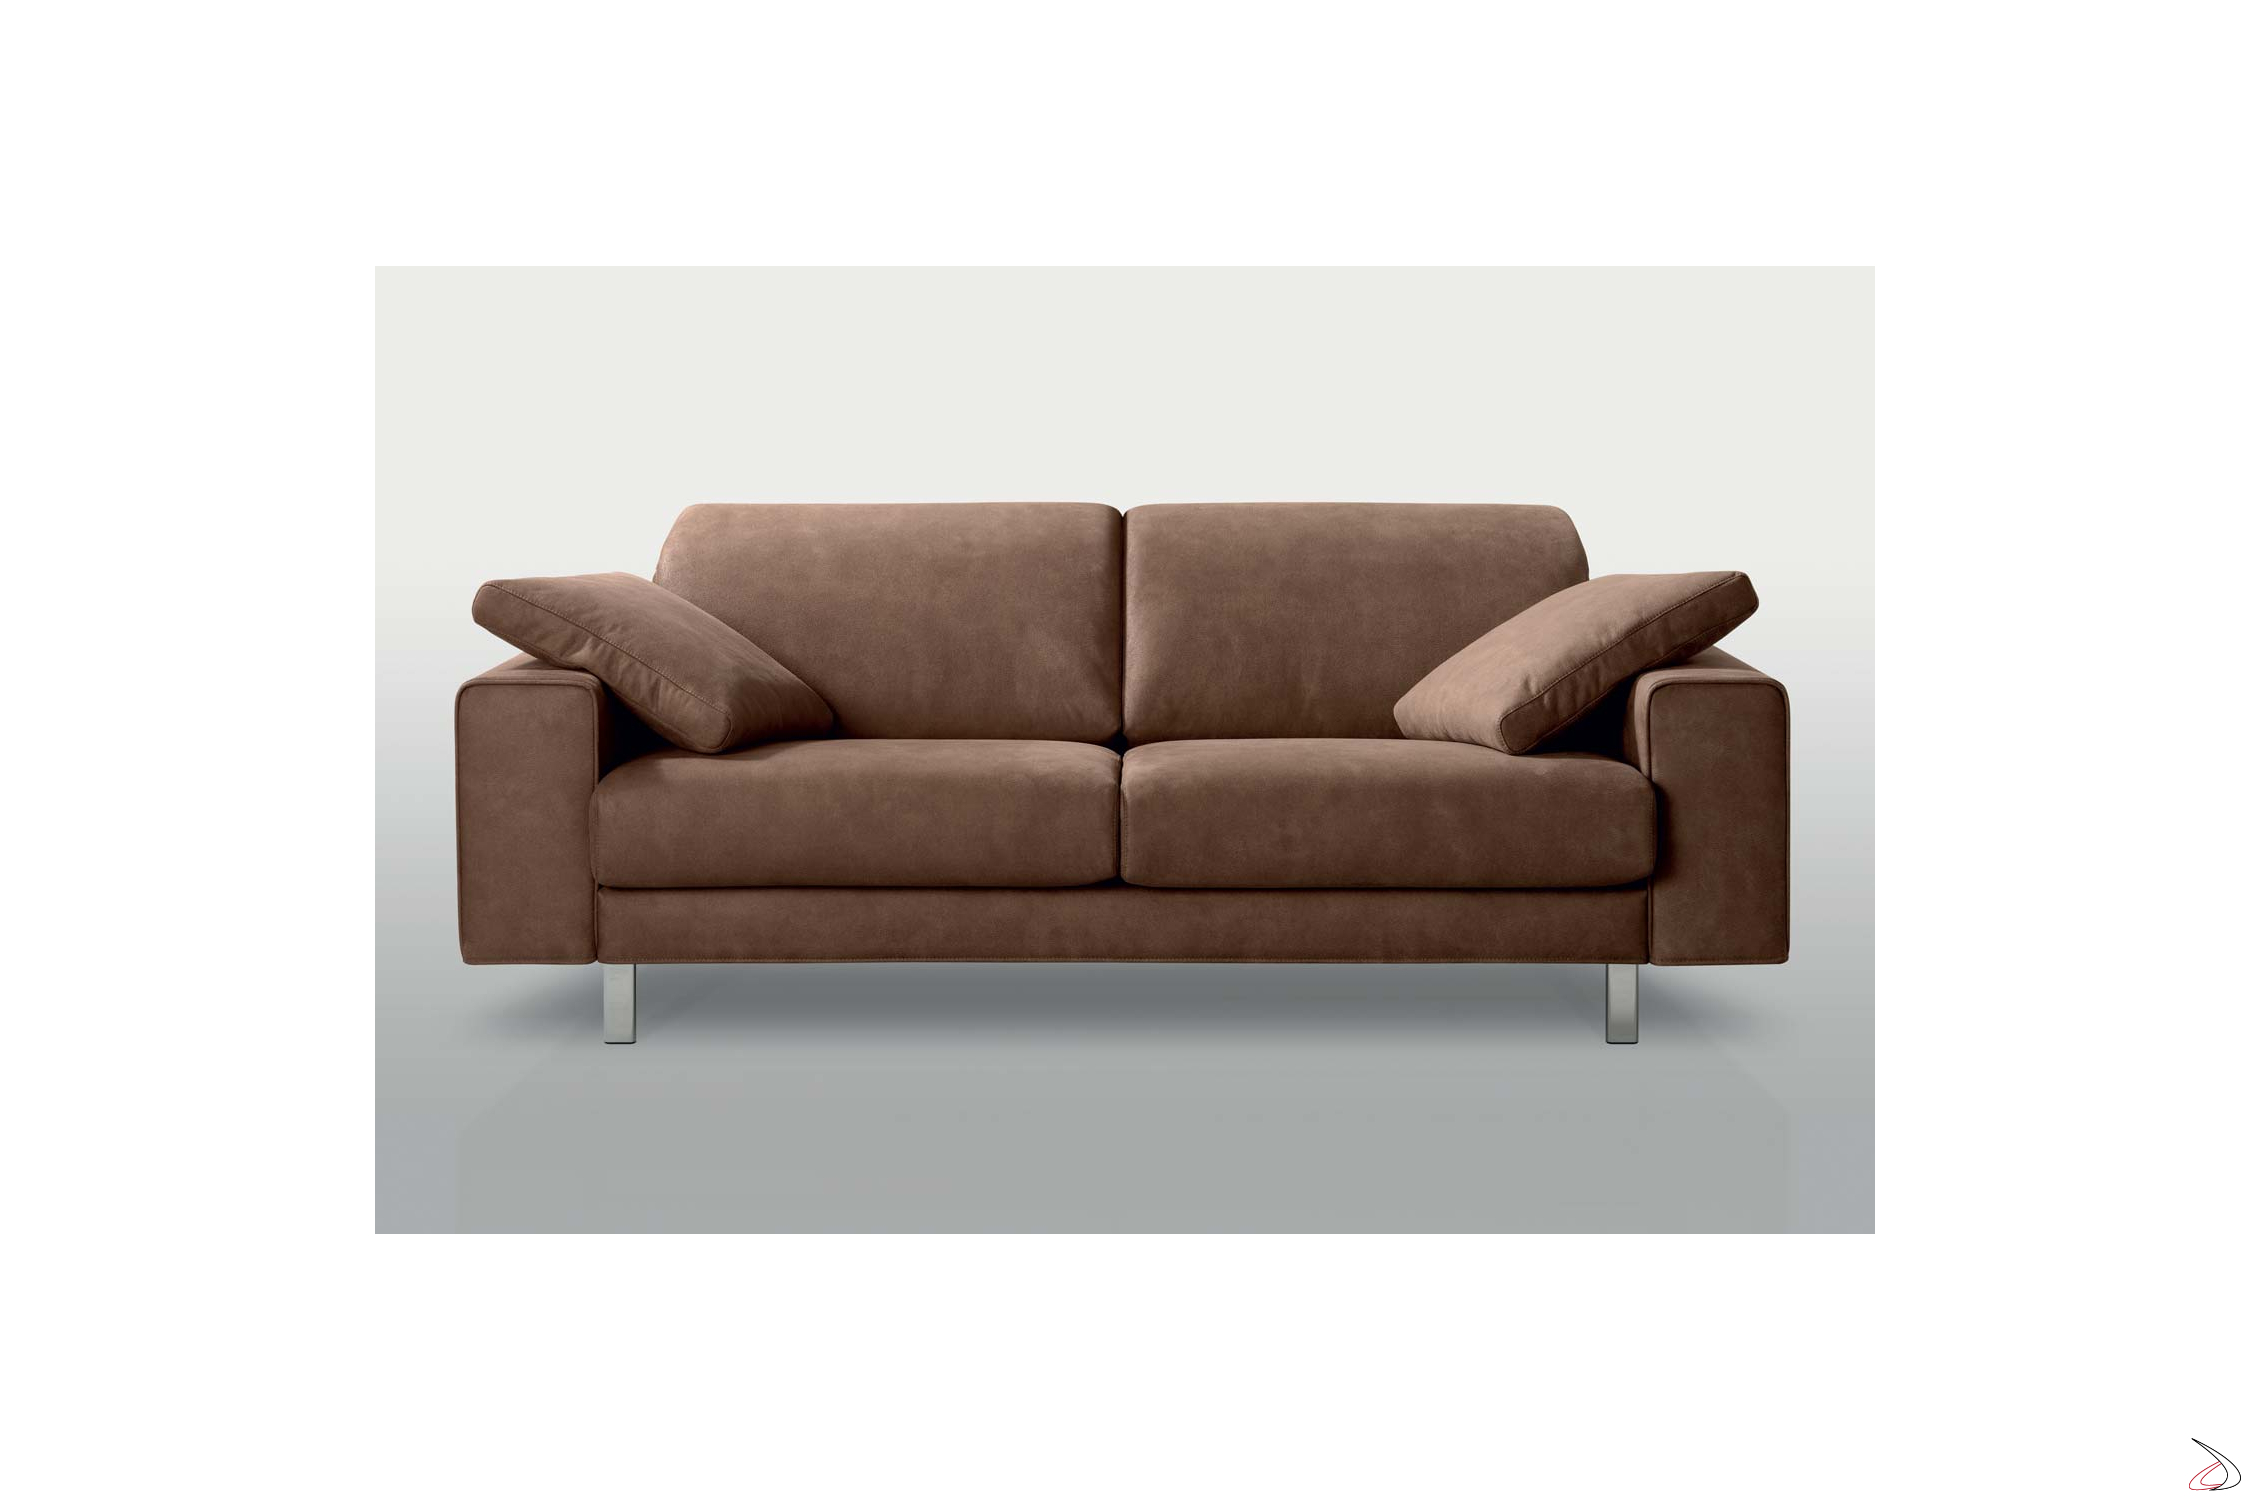 Divano Due Posti Moderno.Limpid Folding Sofa With Backs Toparredi Arredo Design Online